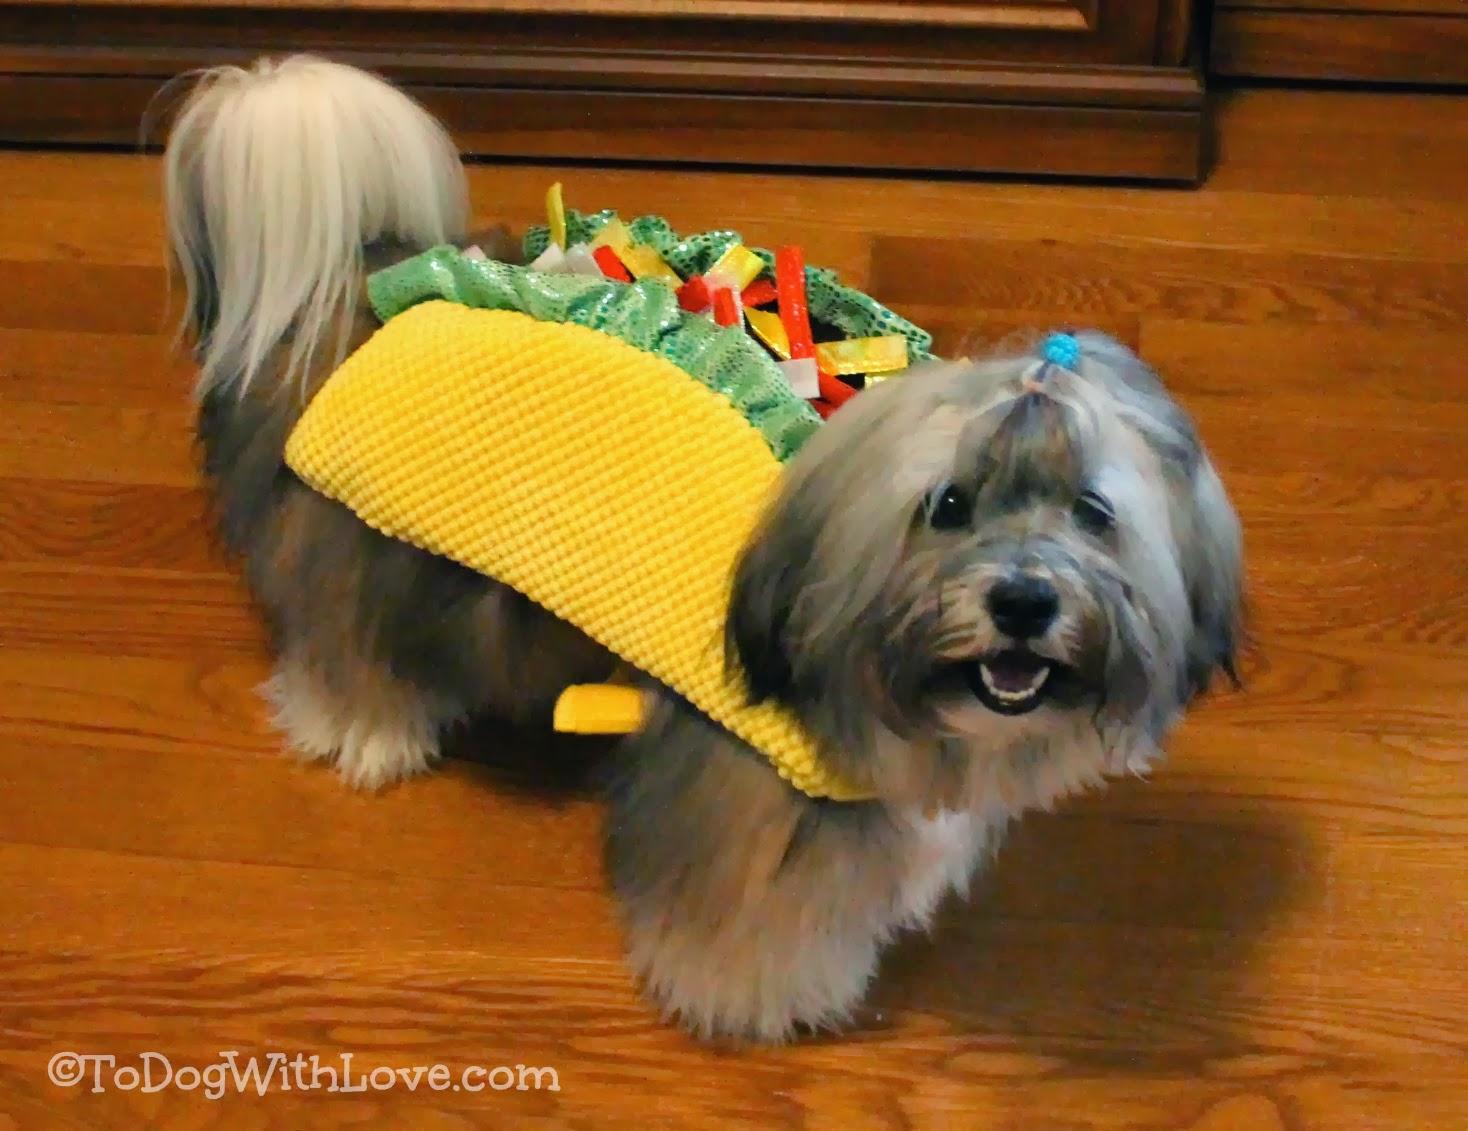 Cool Wallpaper Halloween Puppy - Rocco+Havanese+Petco+Taco+Dog+Halloween+costume  Pic_82177.jpg